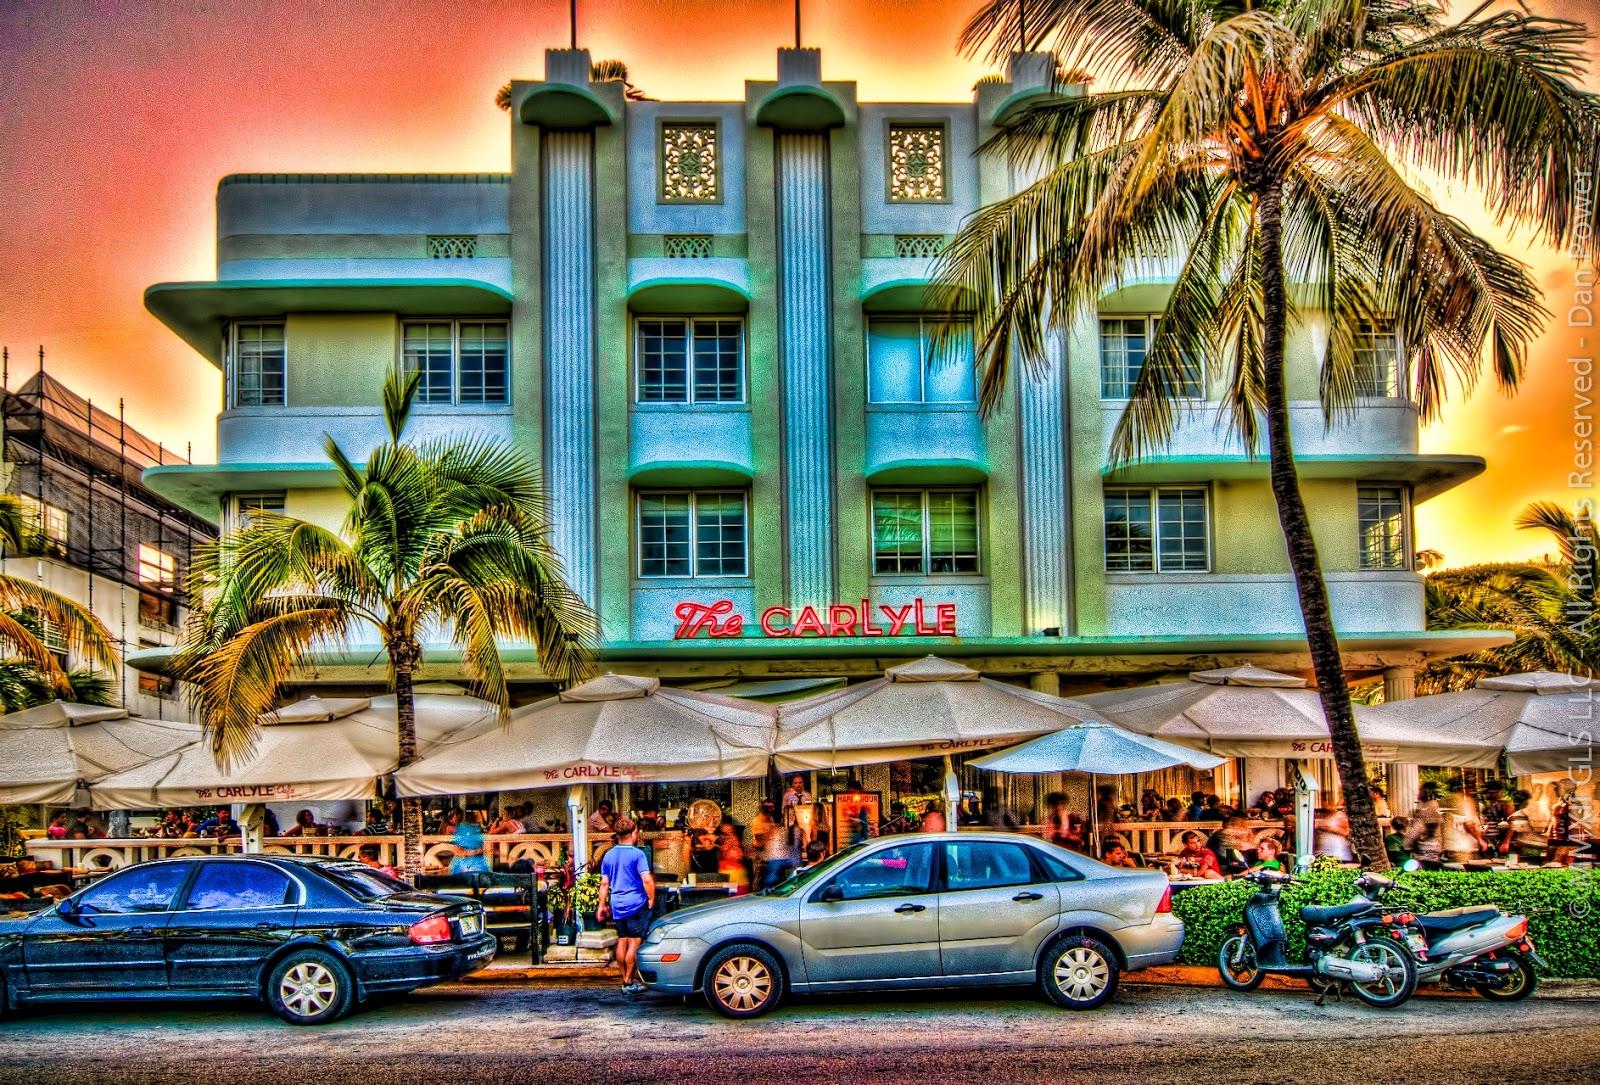 Art Deco Tours popular Miami activity